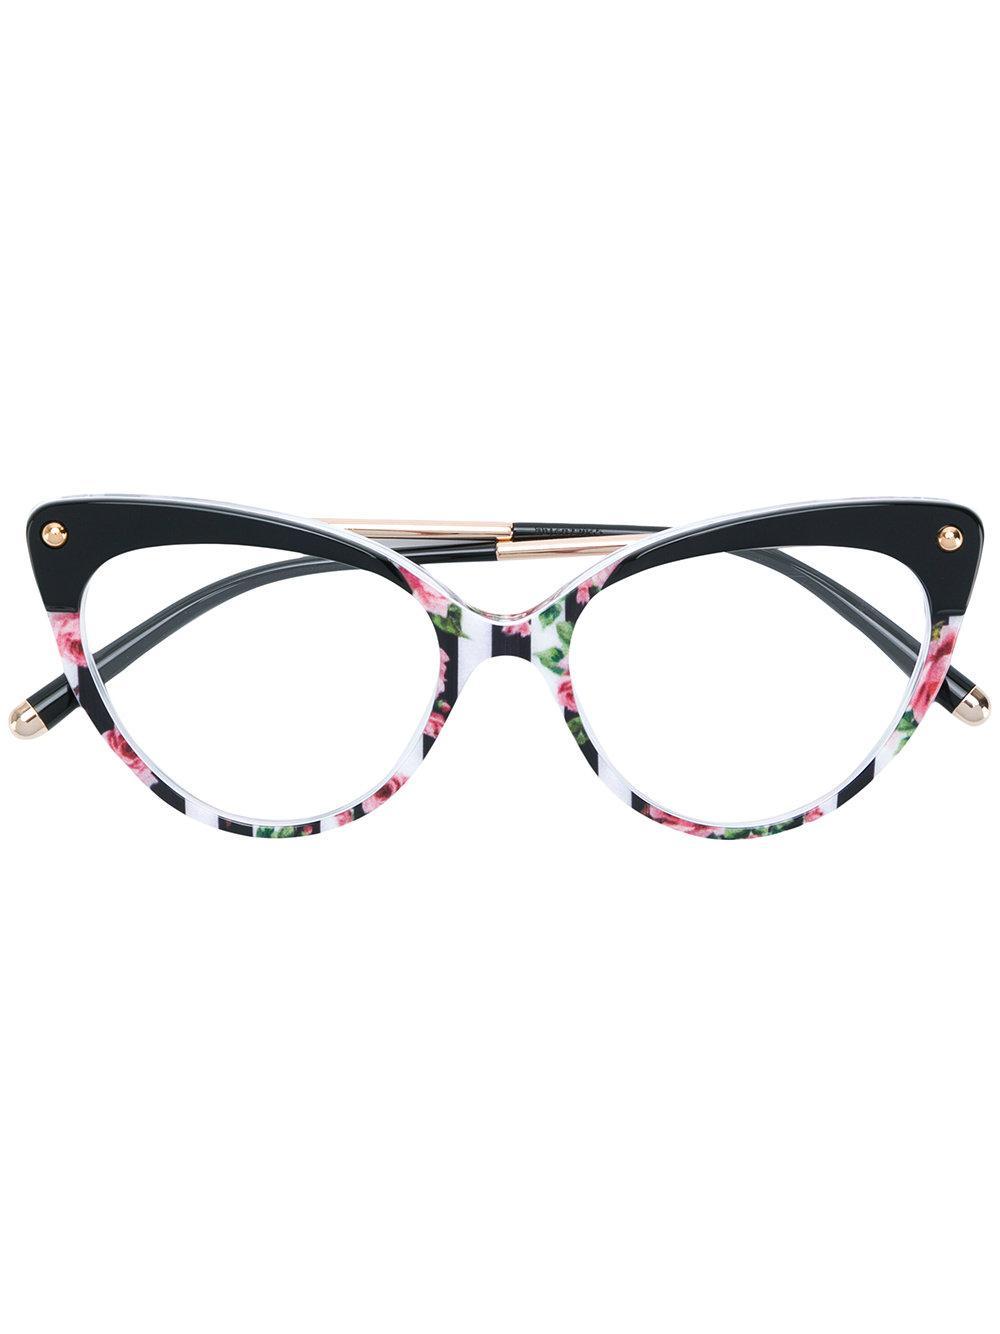 Dolce & Gabbana Cat Eye Frame Floral Print Glasses In Black